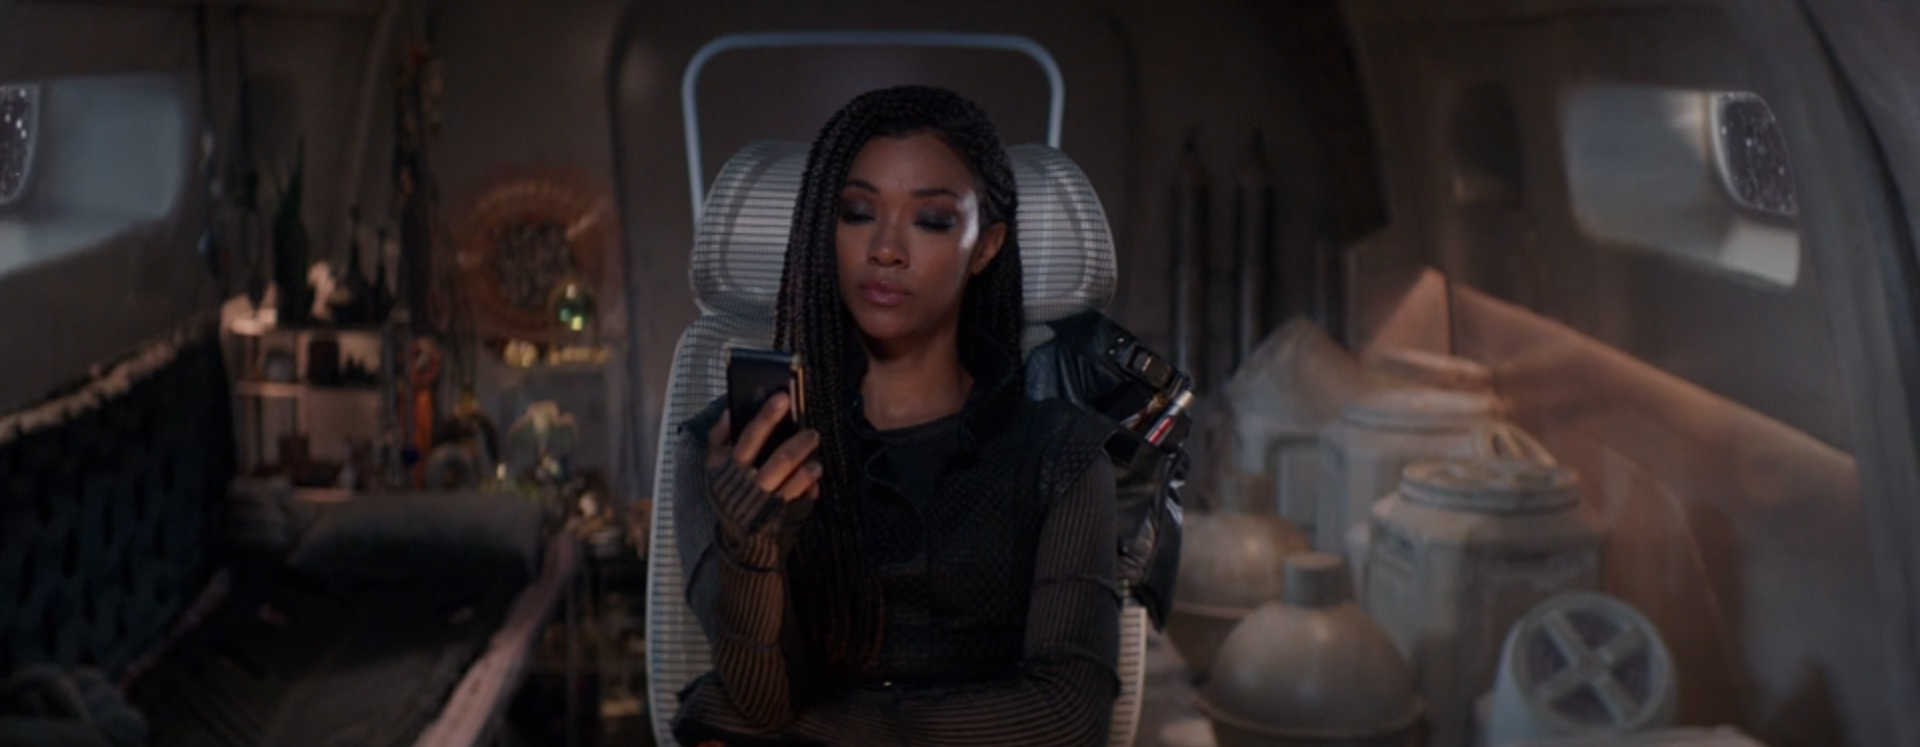 Star Trek Discovery. Image Credit: CBS Studios.